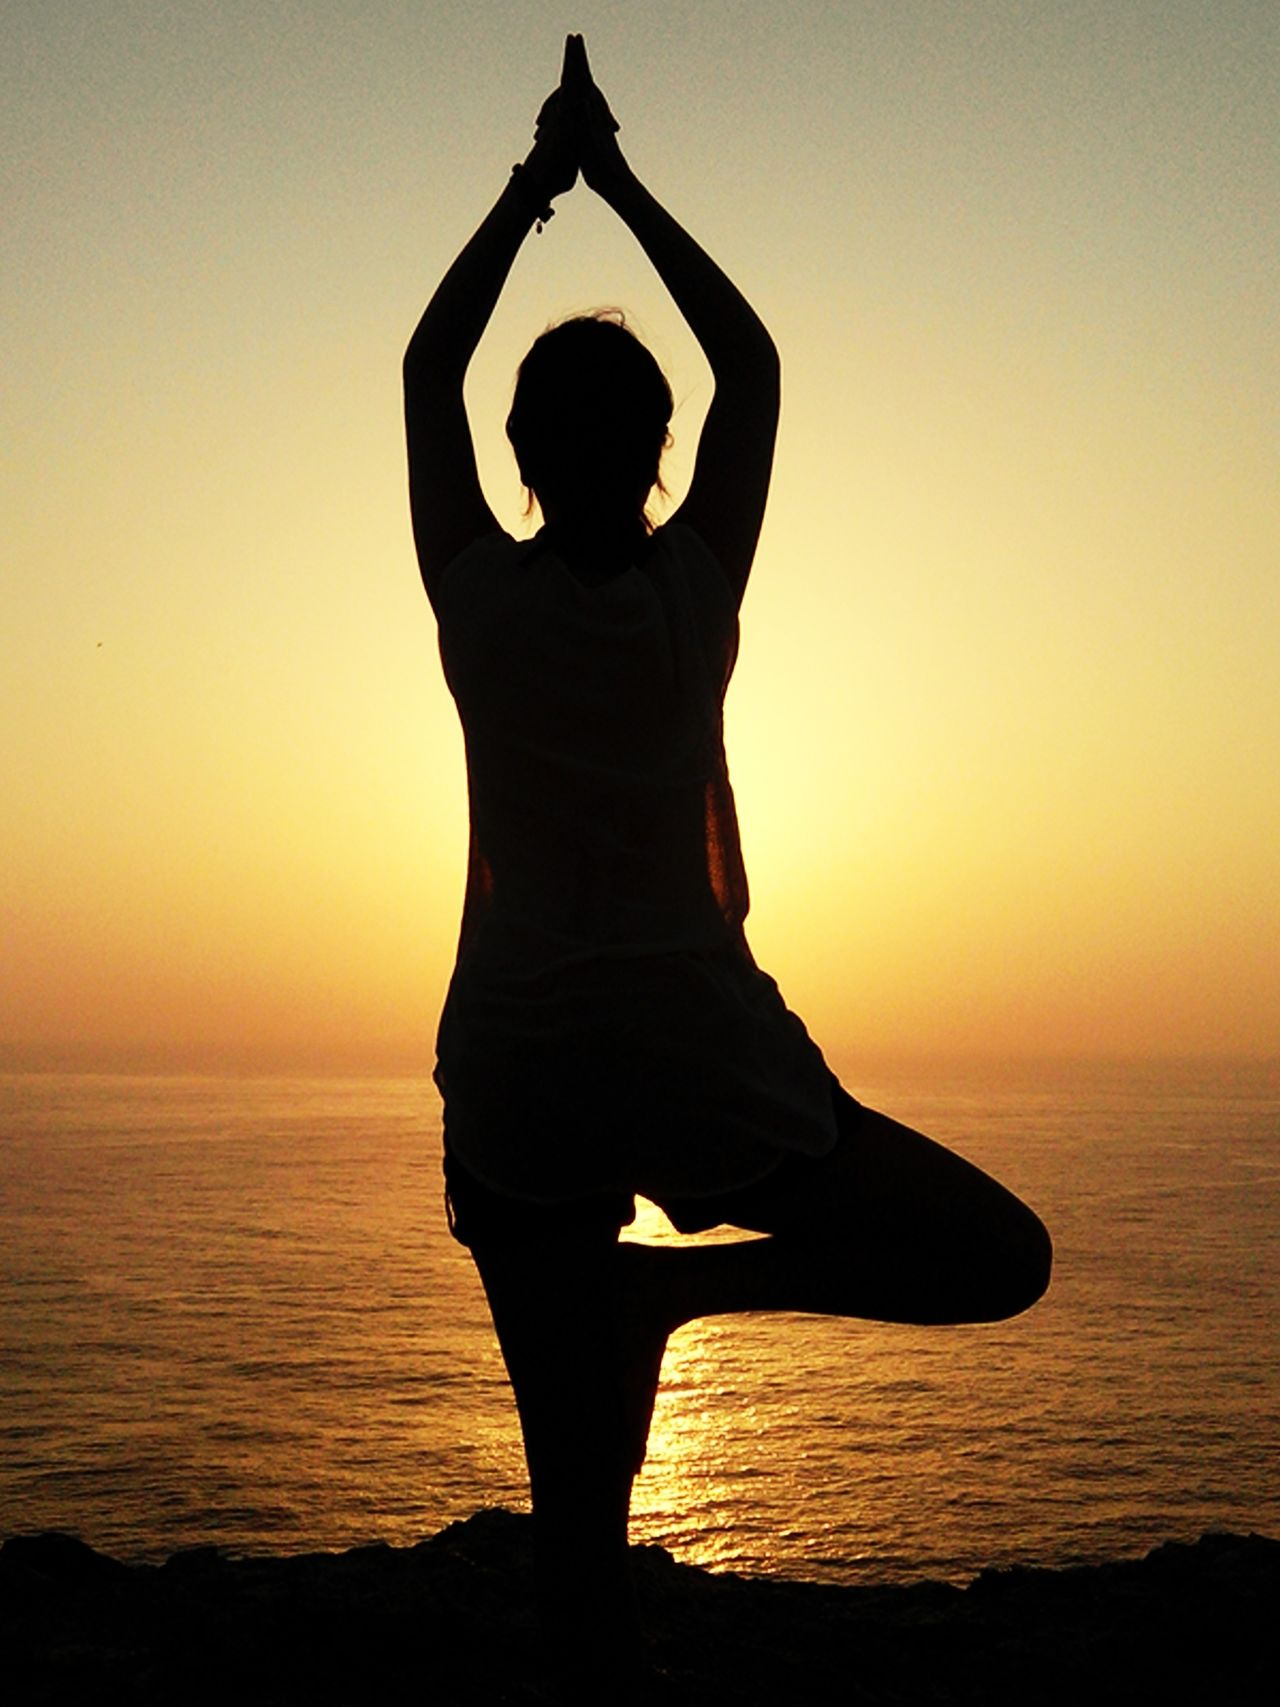 What I Value Ioga Yoga Yoga Pose Yoga ॐ Yogagirl Yogatime Yogalove Yoga Lover Yogainspiration